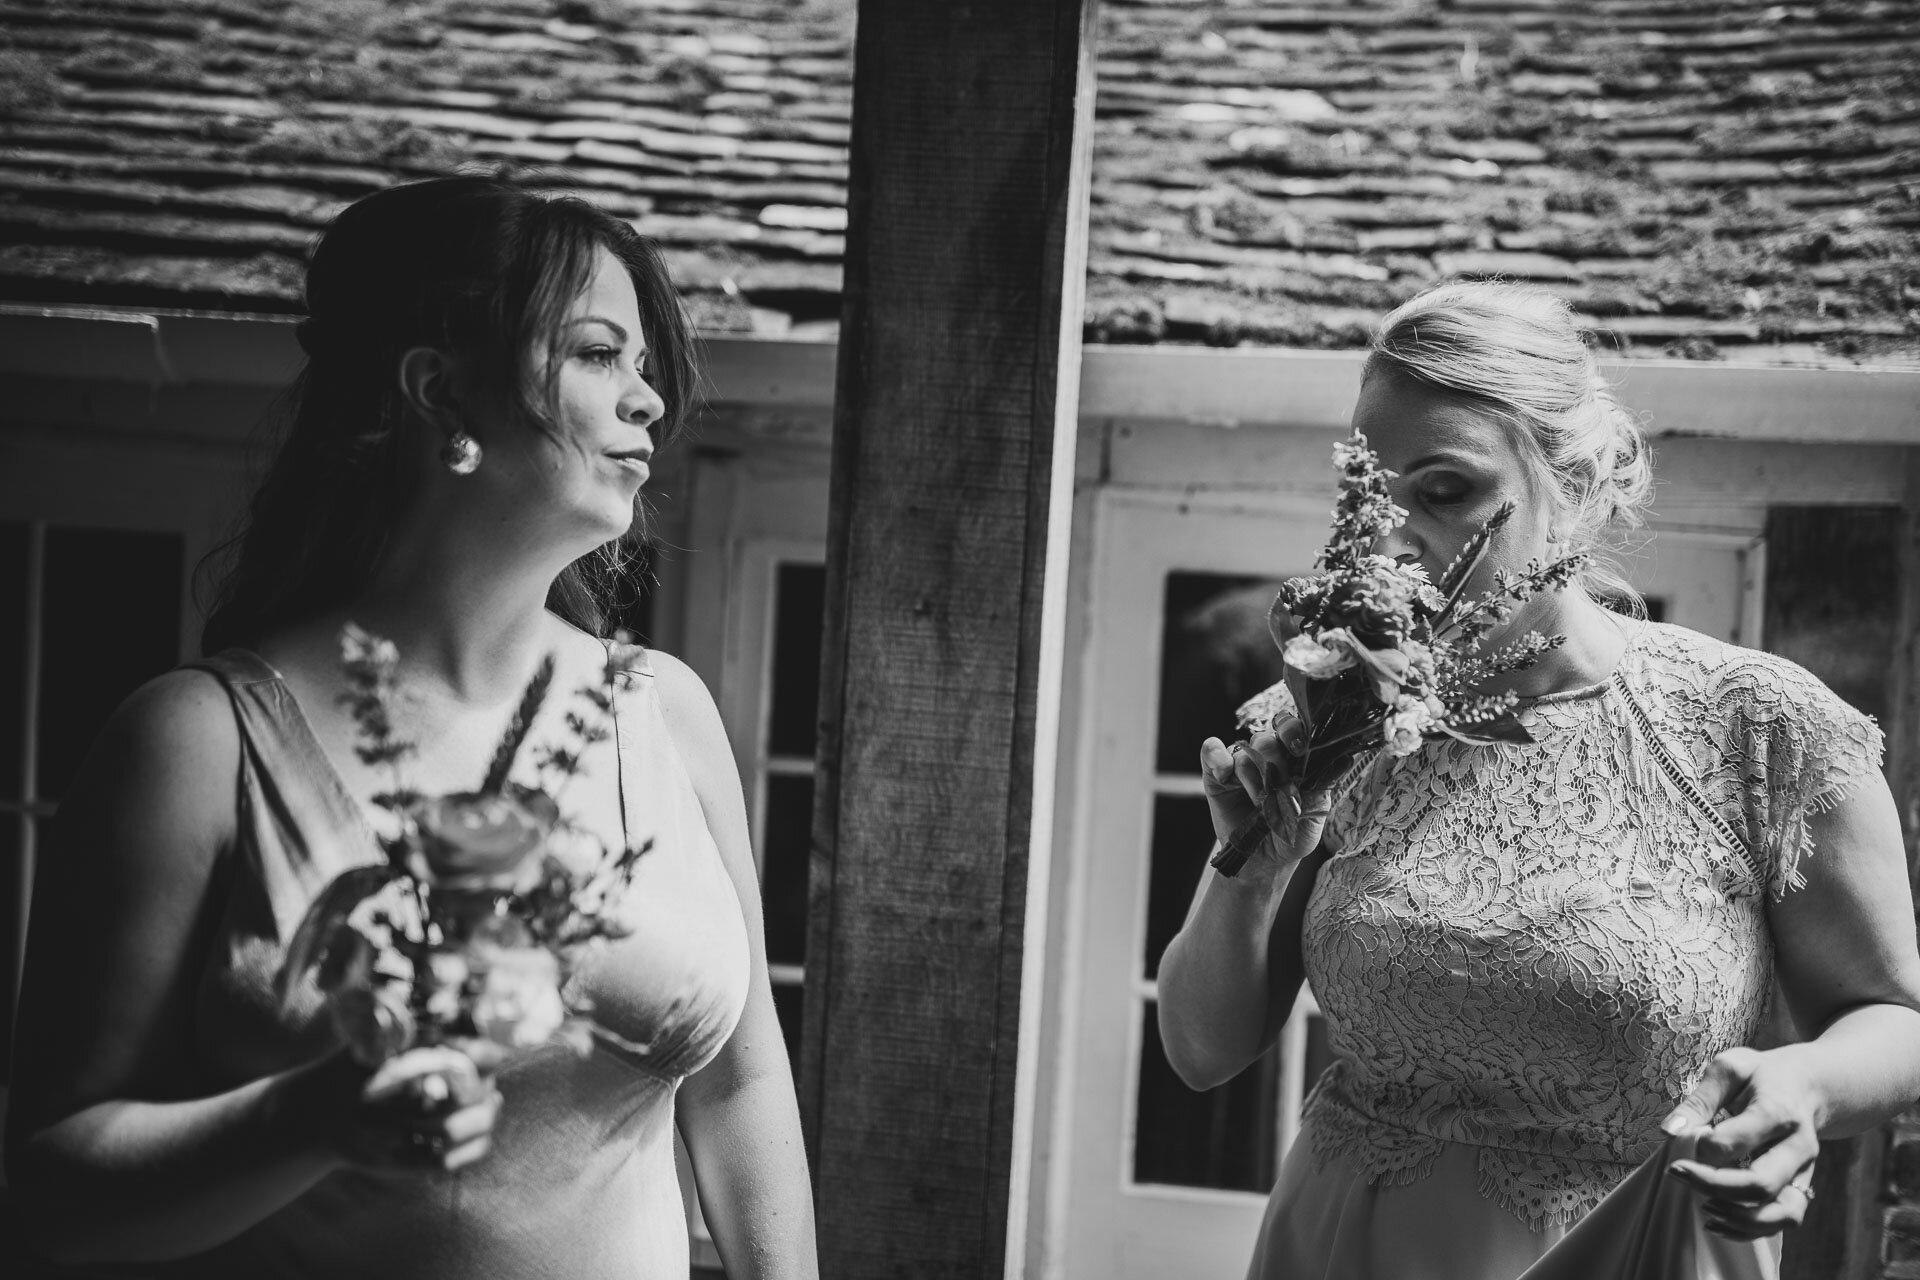 dorset_wedding_photographer-25.jpg